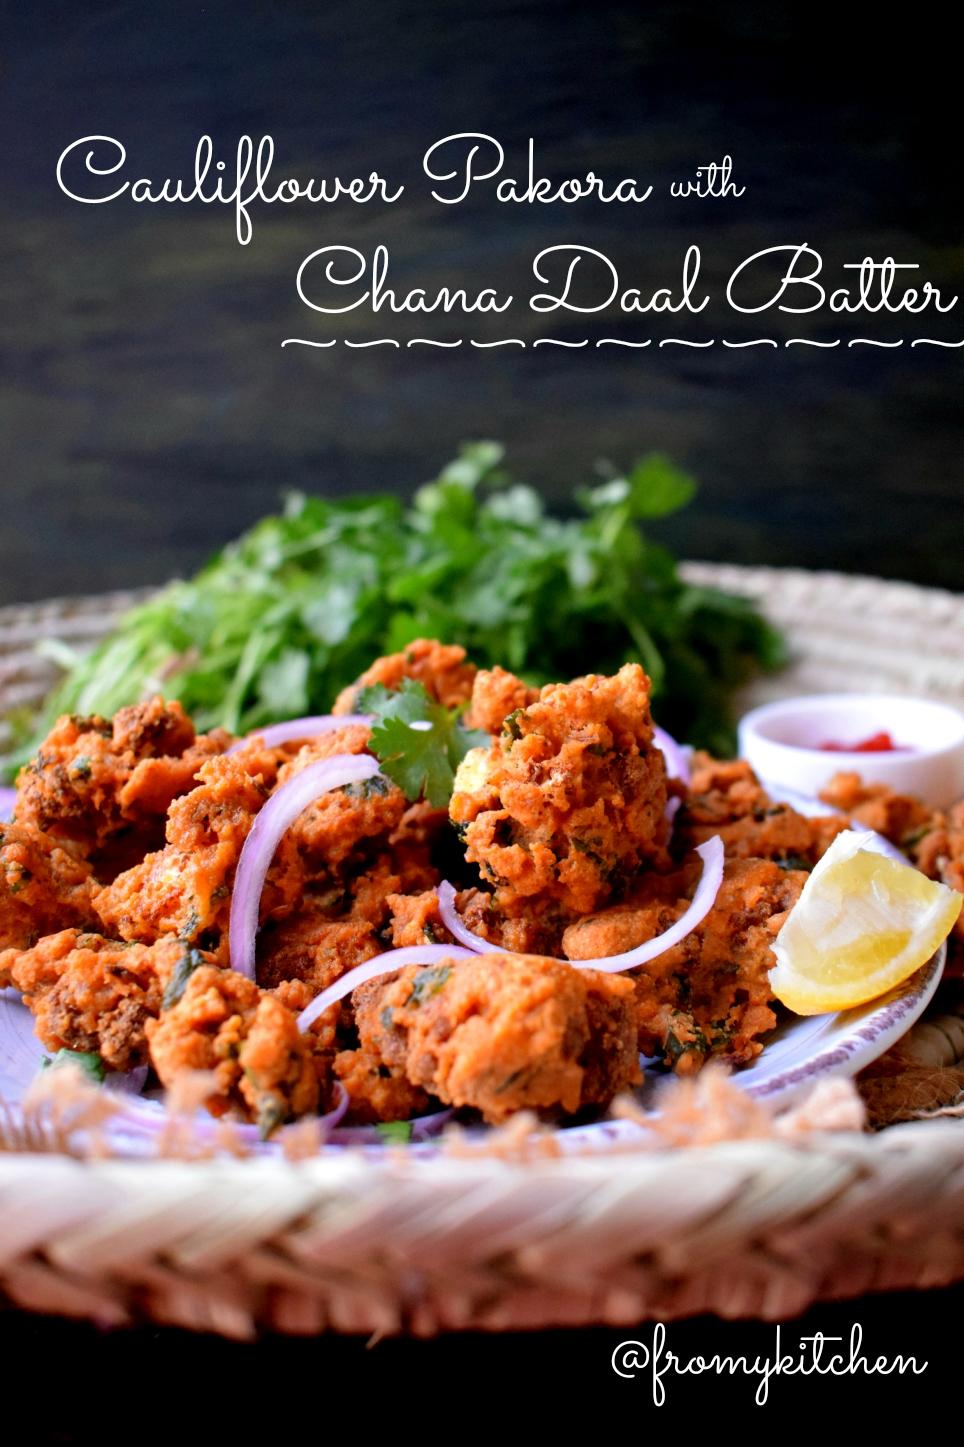 Cauliflower Pakoda with Chana Daal Batter